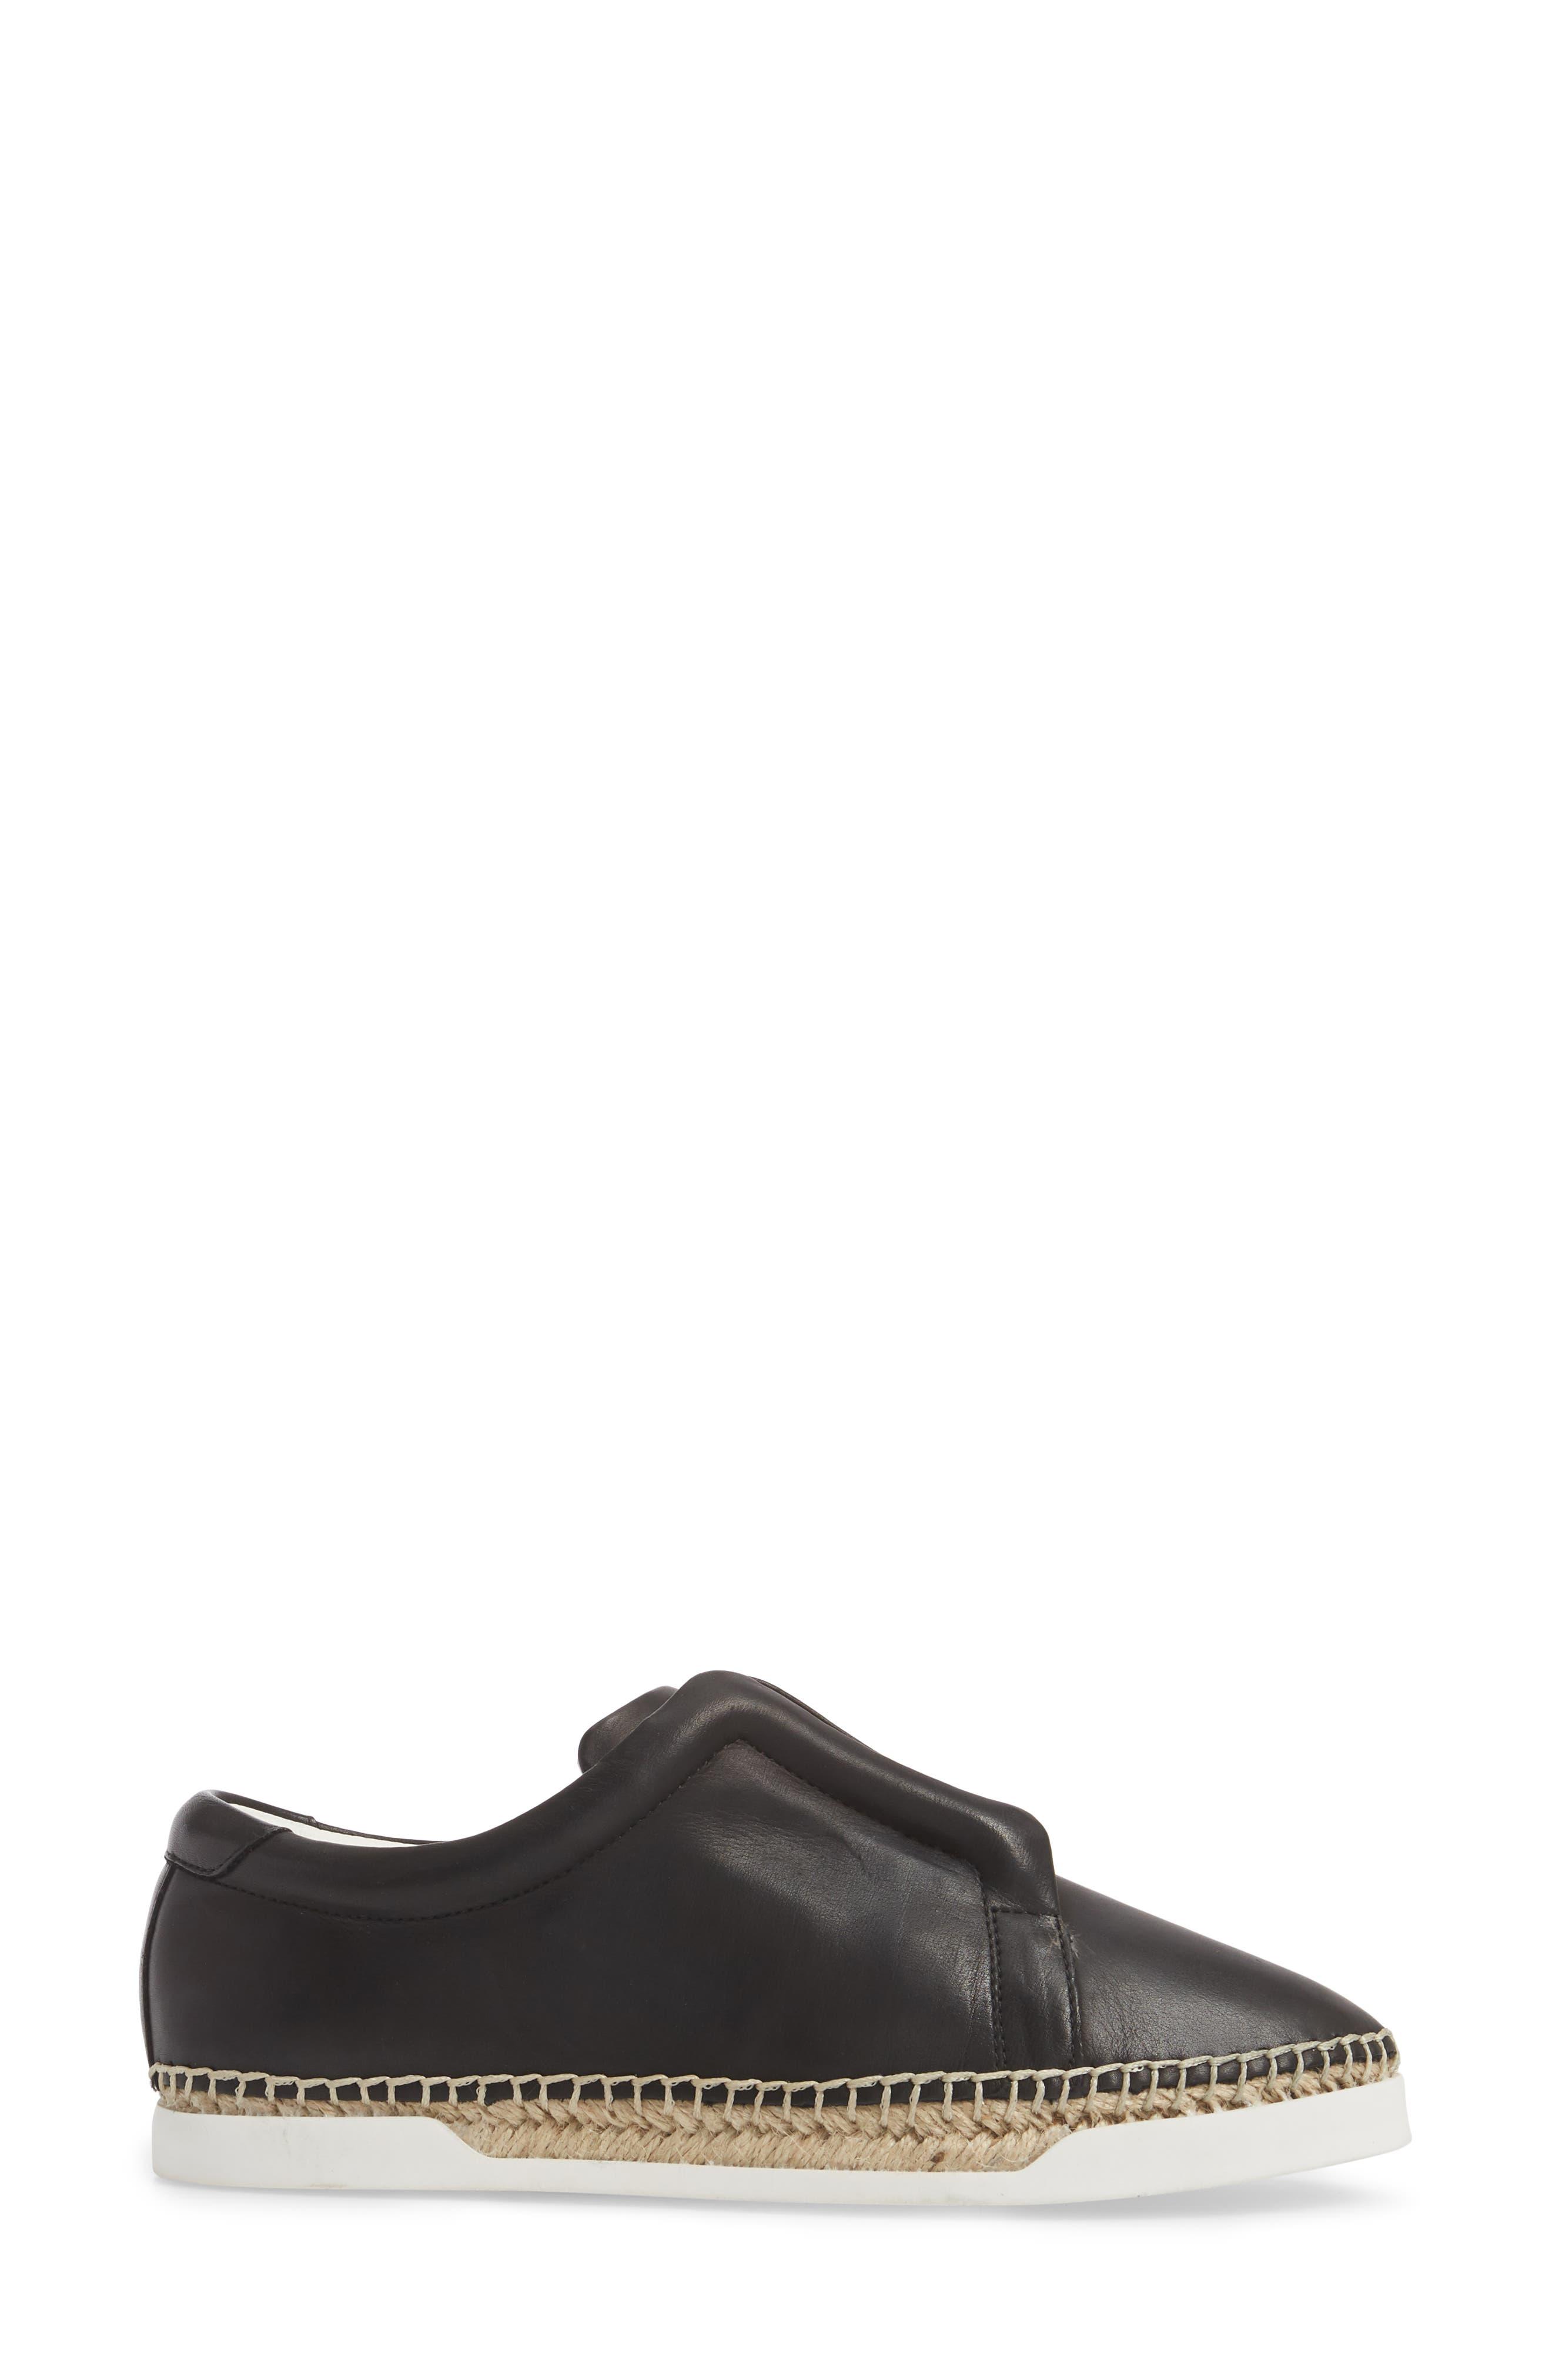 M4D3 Elizabeth Espadrille Slip-On Sneaker,                             Alternate thumbnail 3, color,                             Black Leather